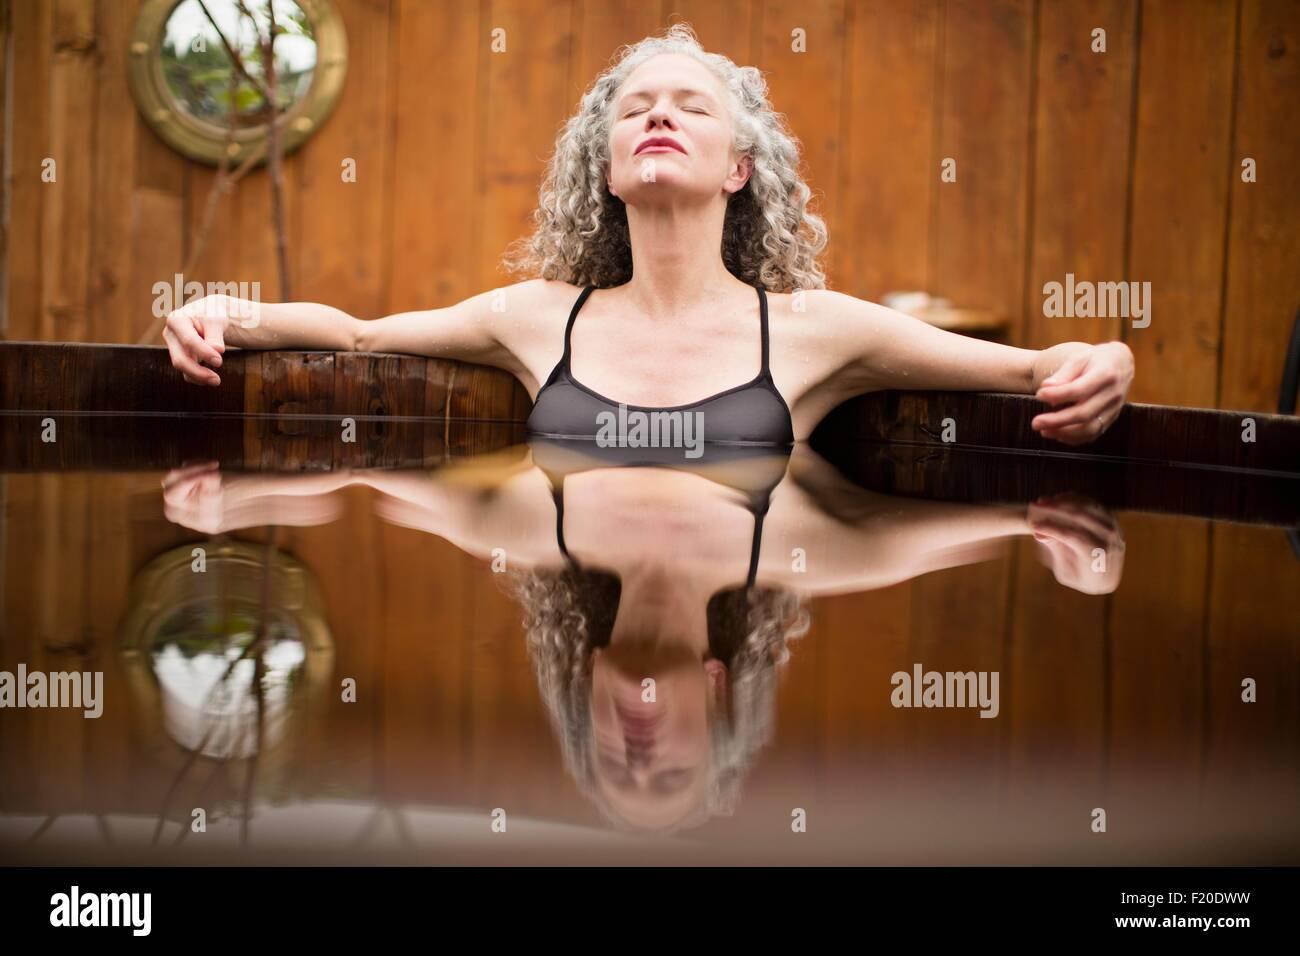 Reife Frau mit geschlossenen Augen in Whirlpool Eco Retreat Meditation Stockbild